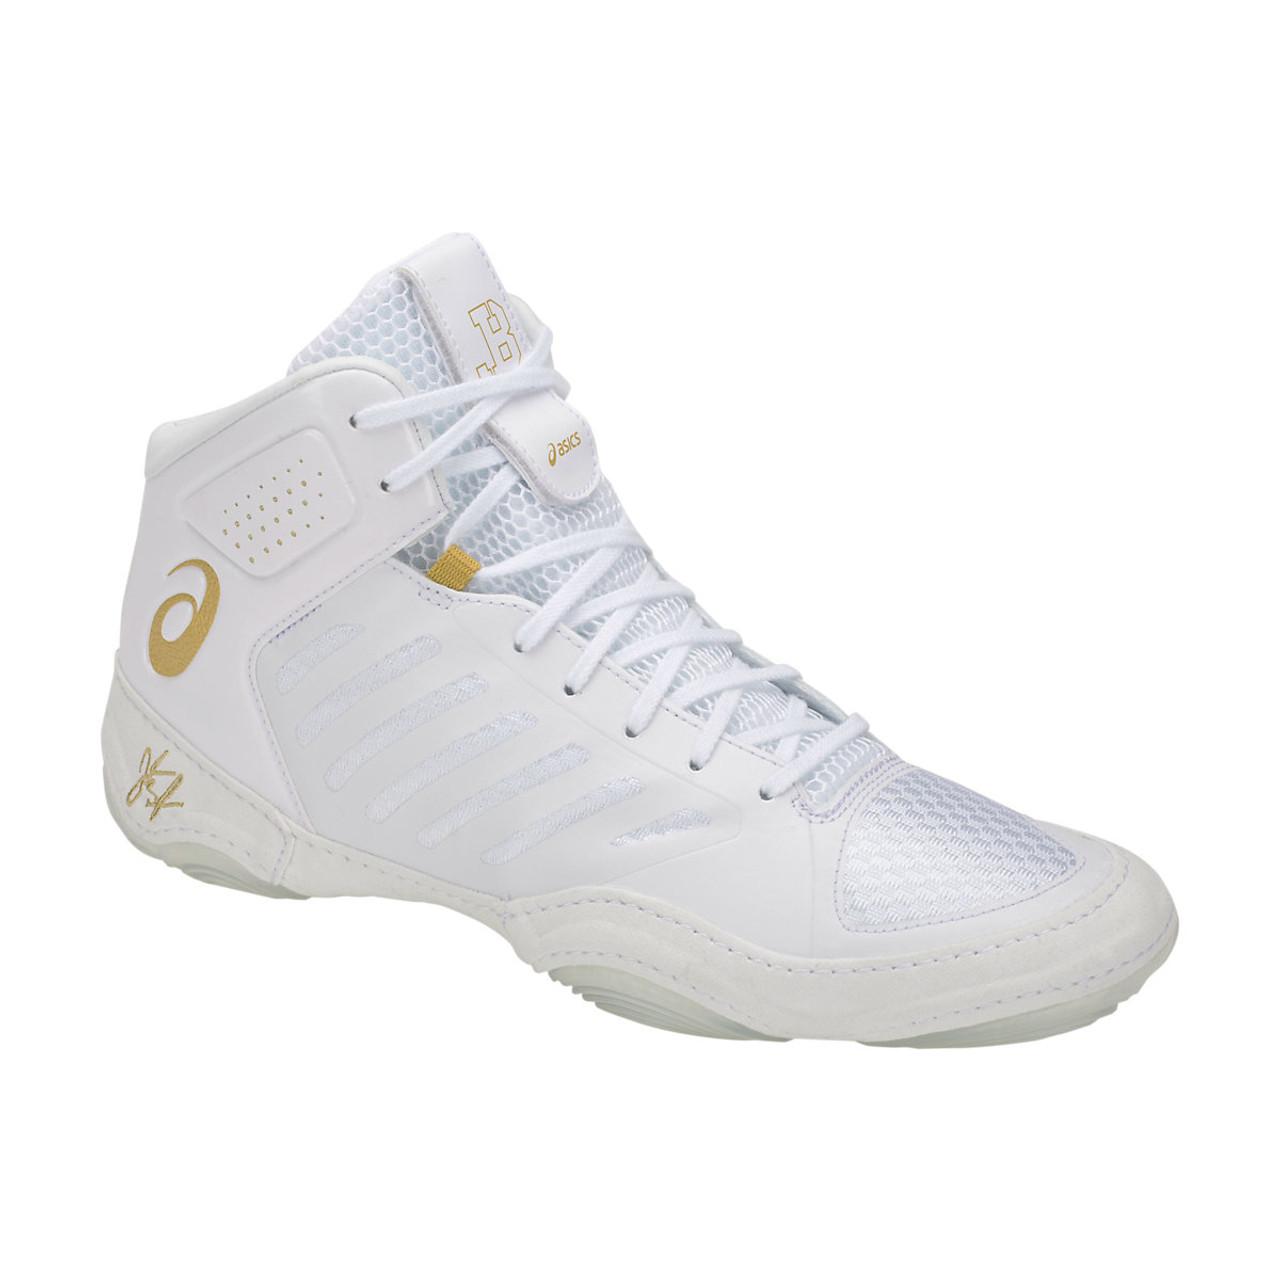 separation shoes 5b1ed 1a832 Asics JB Elite III Men s Wrestling Shoes · Asics JB Elite III Men s  Wrestling ...